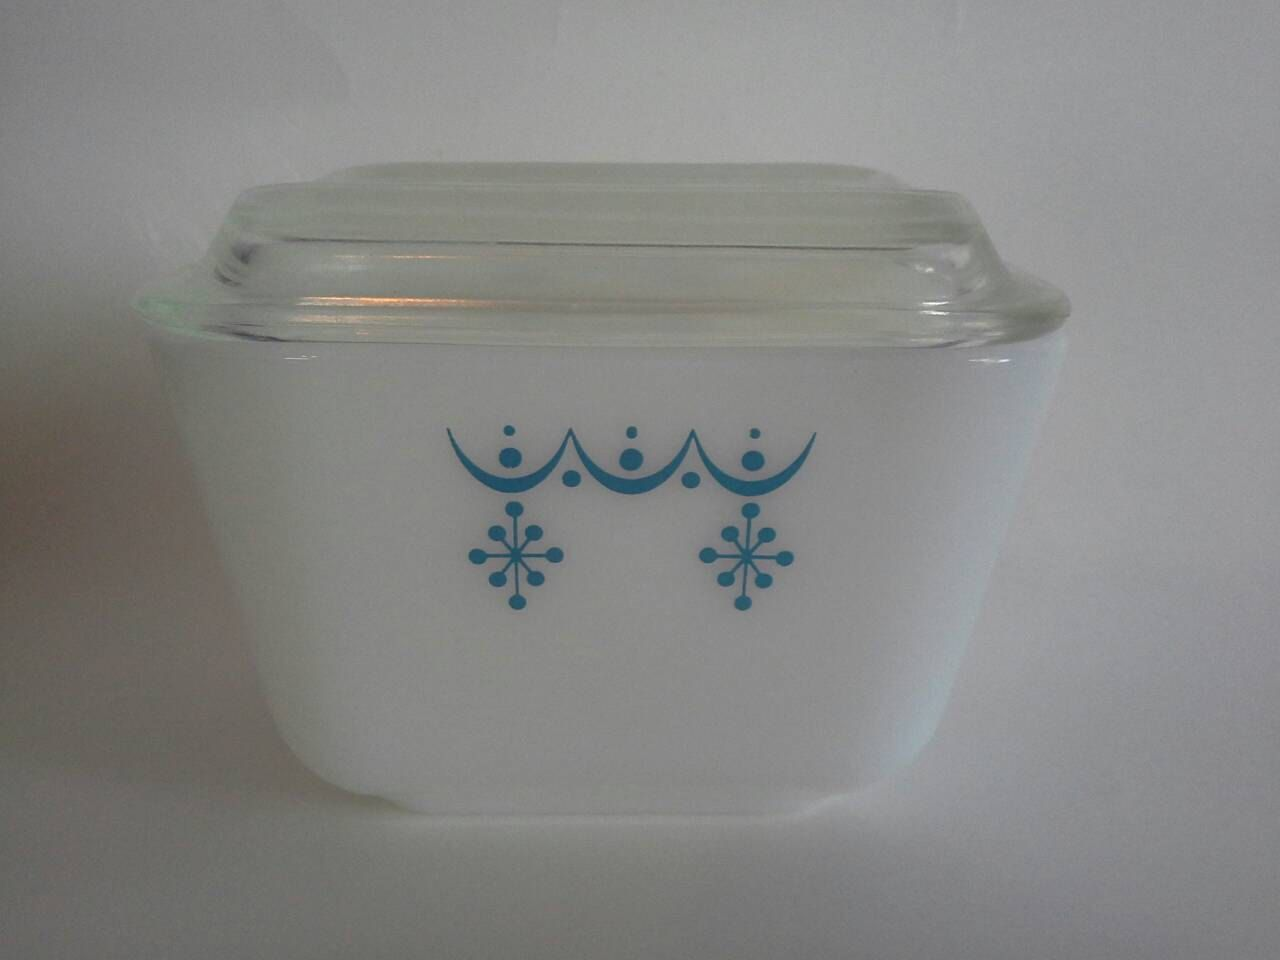 Vintage Pyrex 1 1 2 Cup Snowflake Blue Garland Refrigerator Dish 501 Pyrex Vintage Vintage Pyrex Patterns Pyrex Patterns